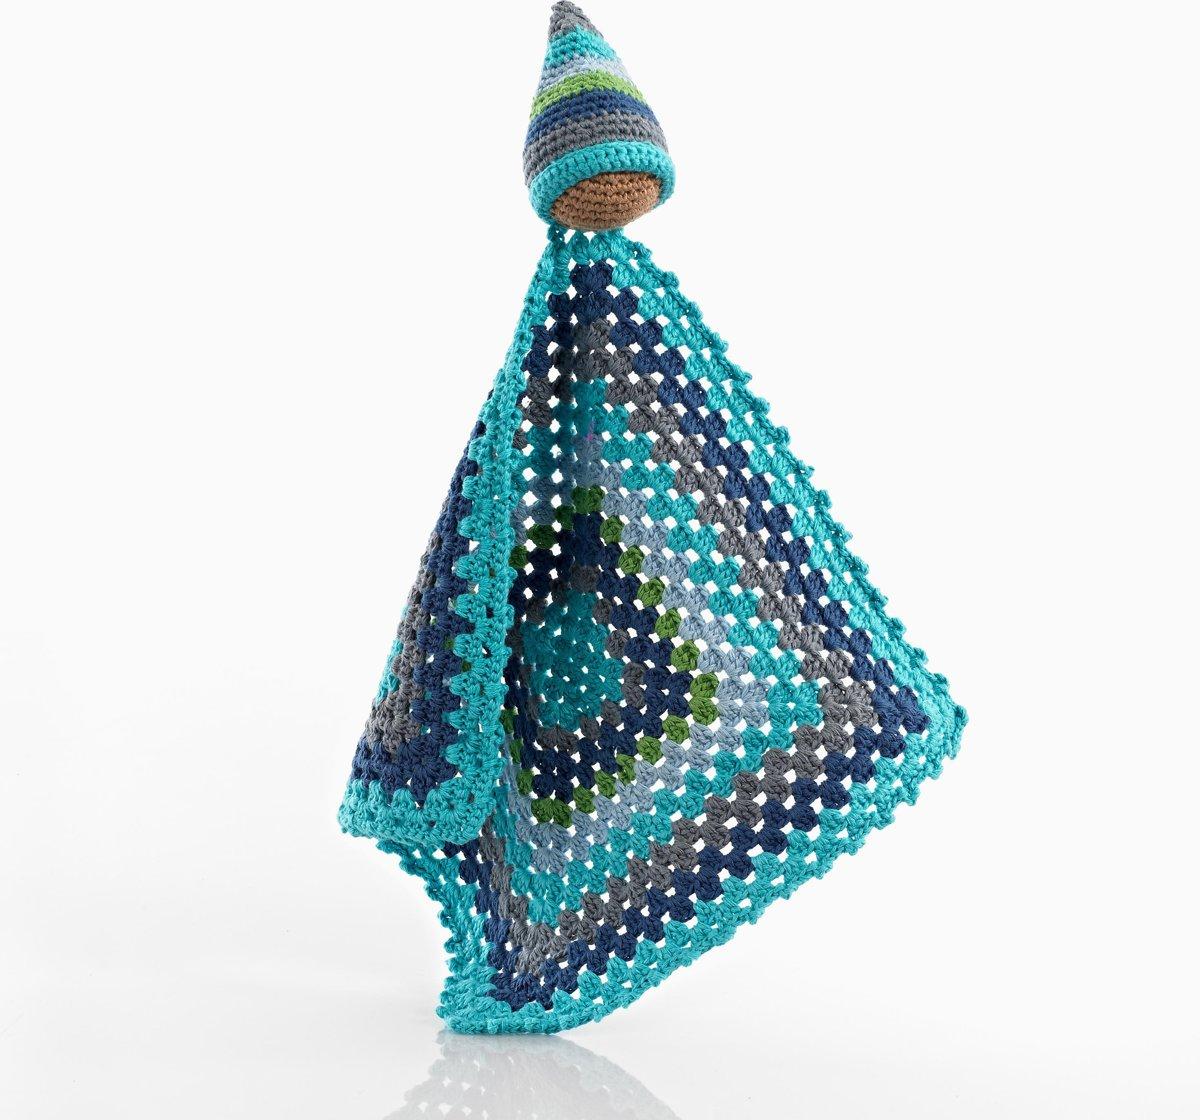 Pebble knuffeldoek - Pixie blauw